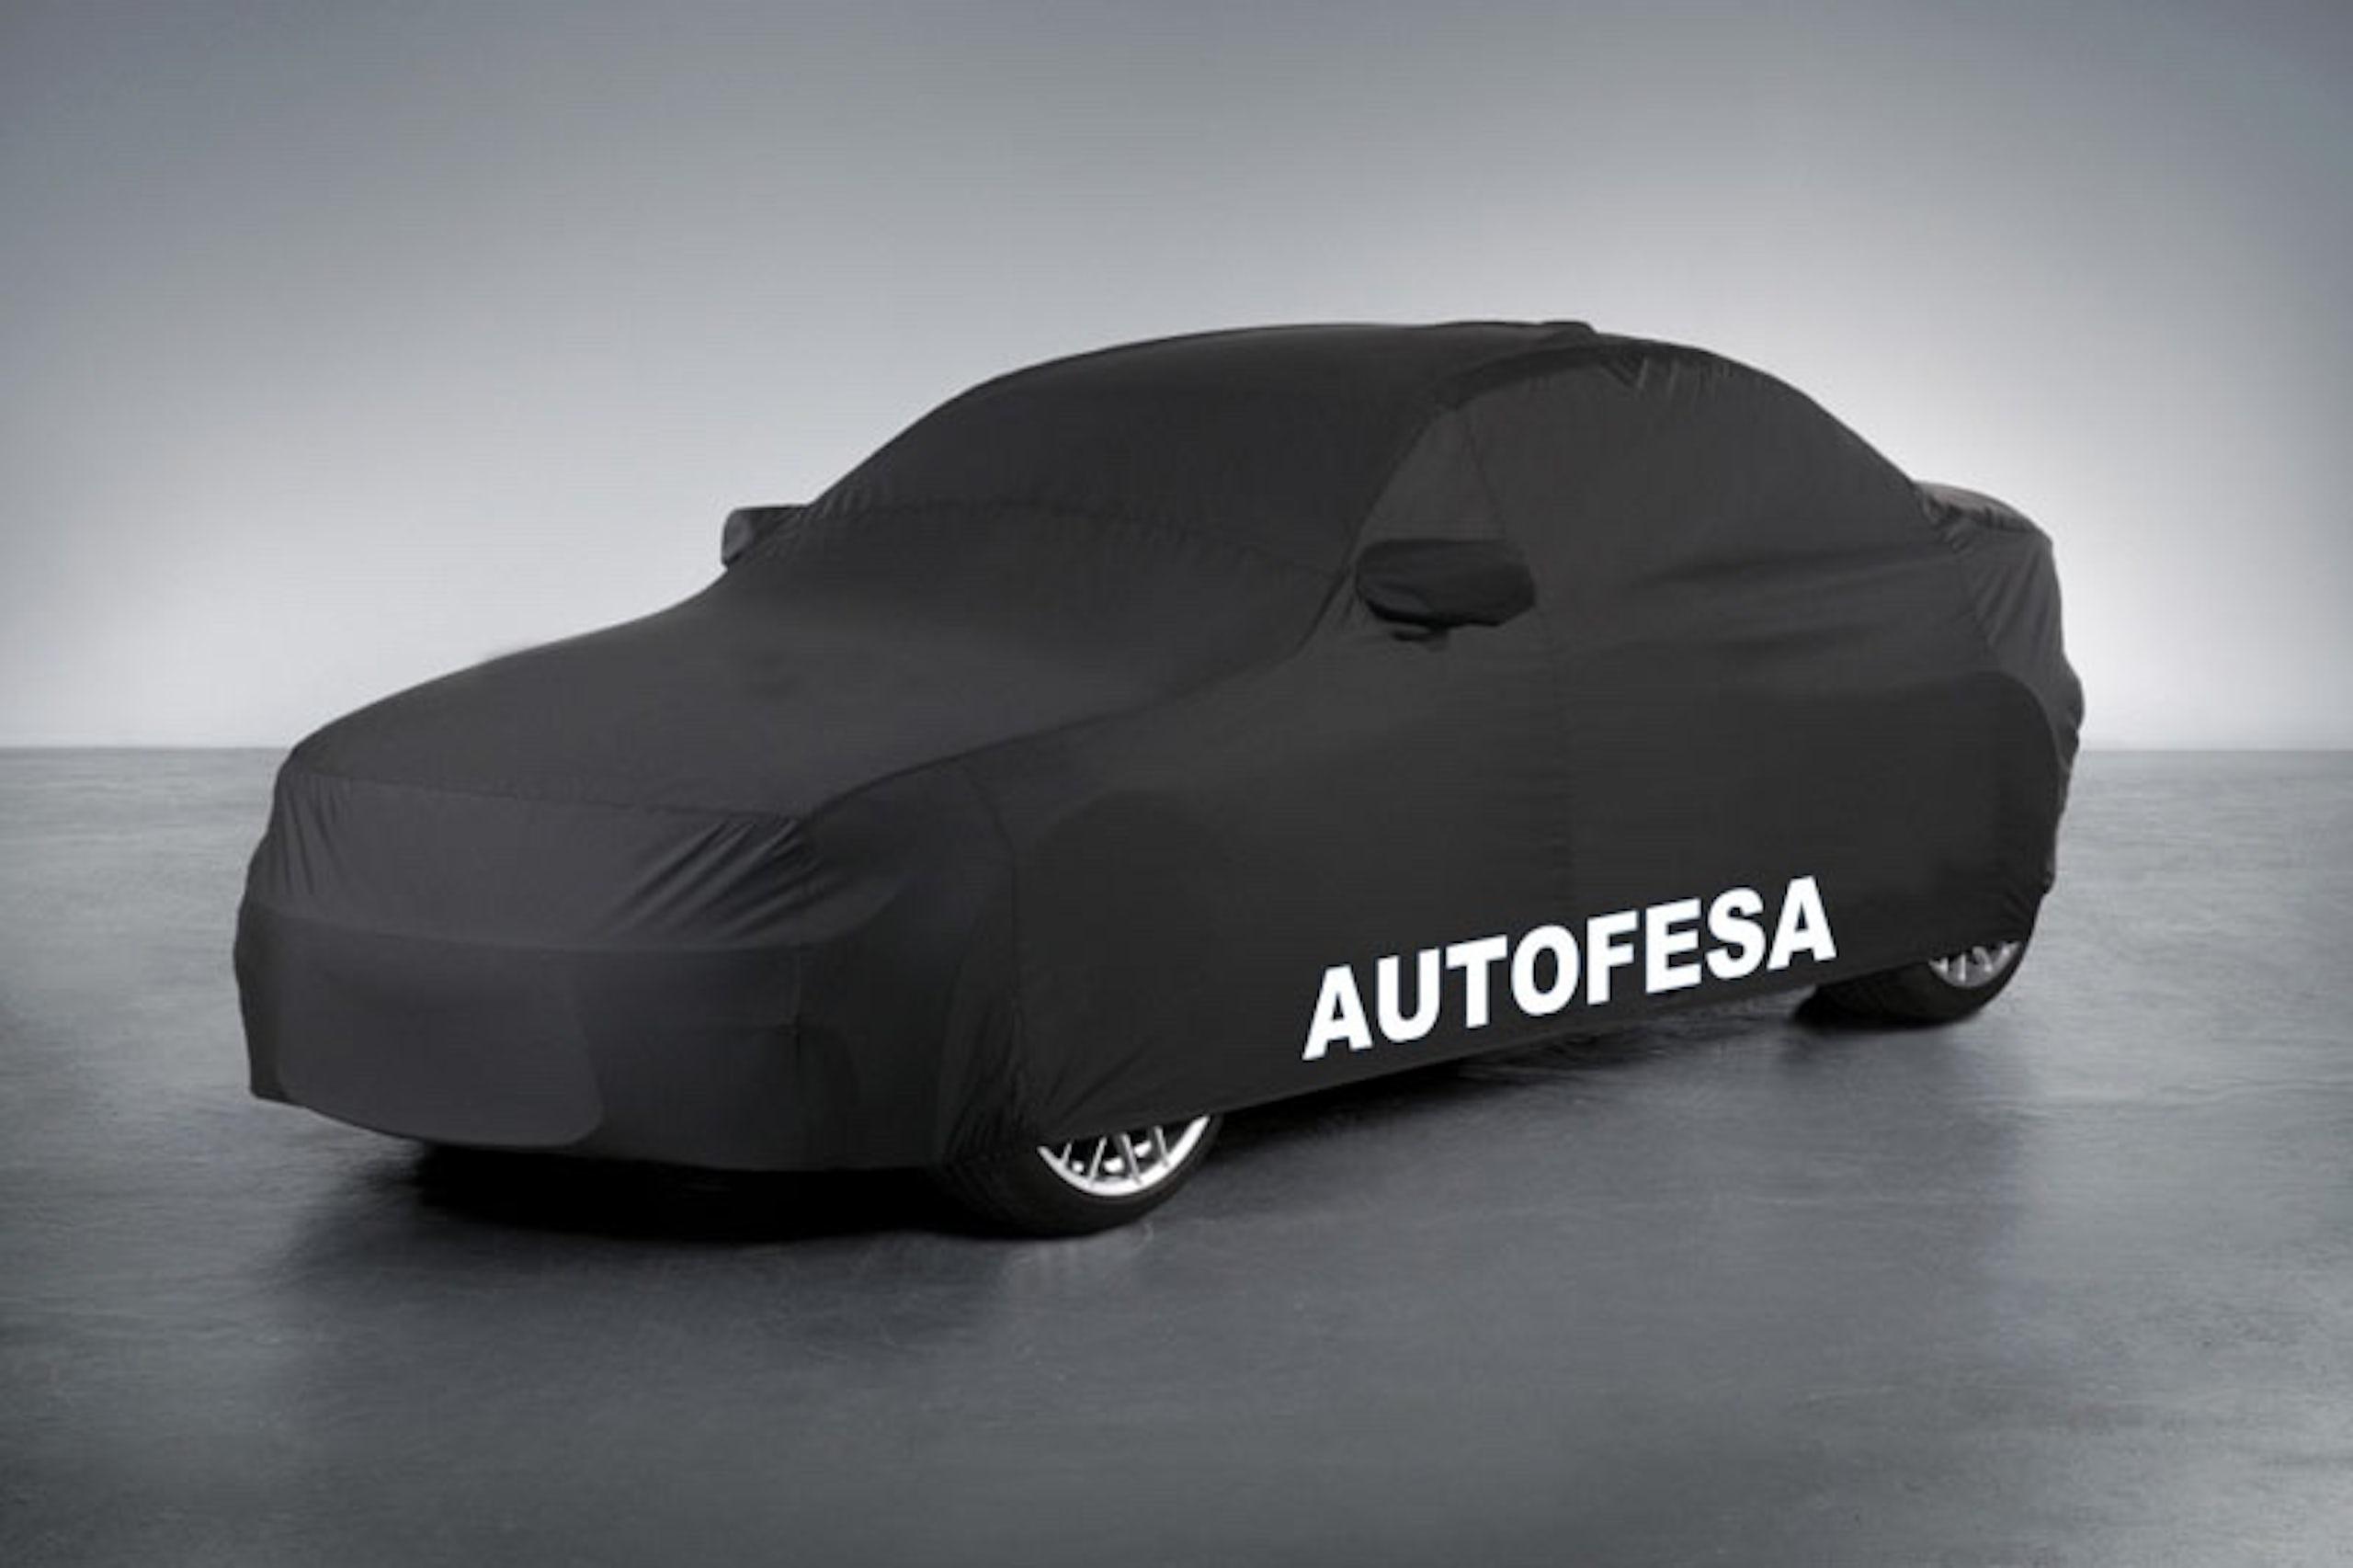 Lexus Nx 300h 300h 2.5 197cv Executive Tecno 4WD 5p CVT Auto - Foto 1